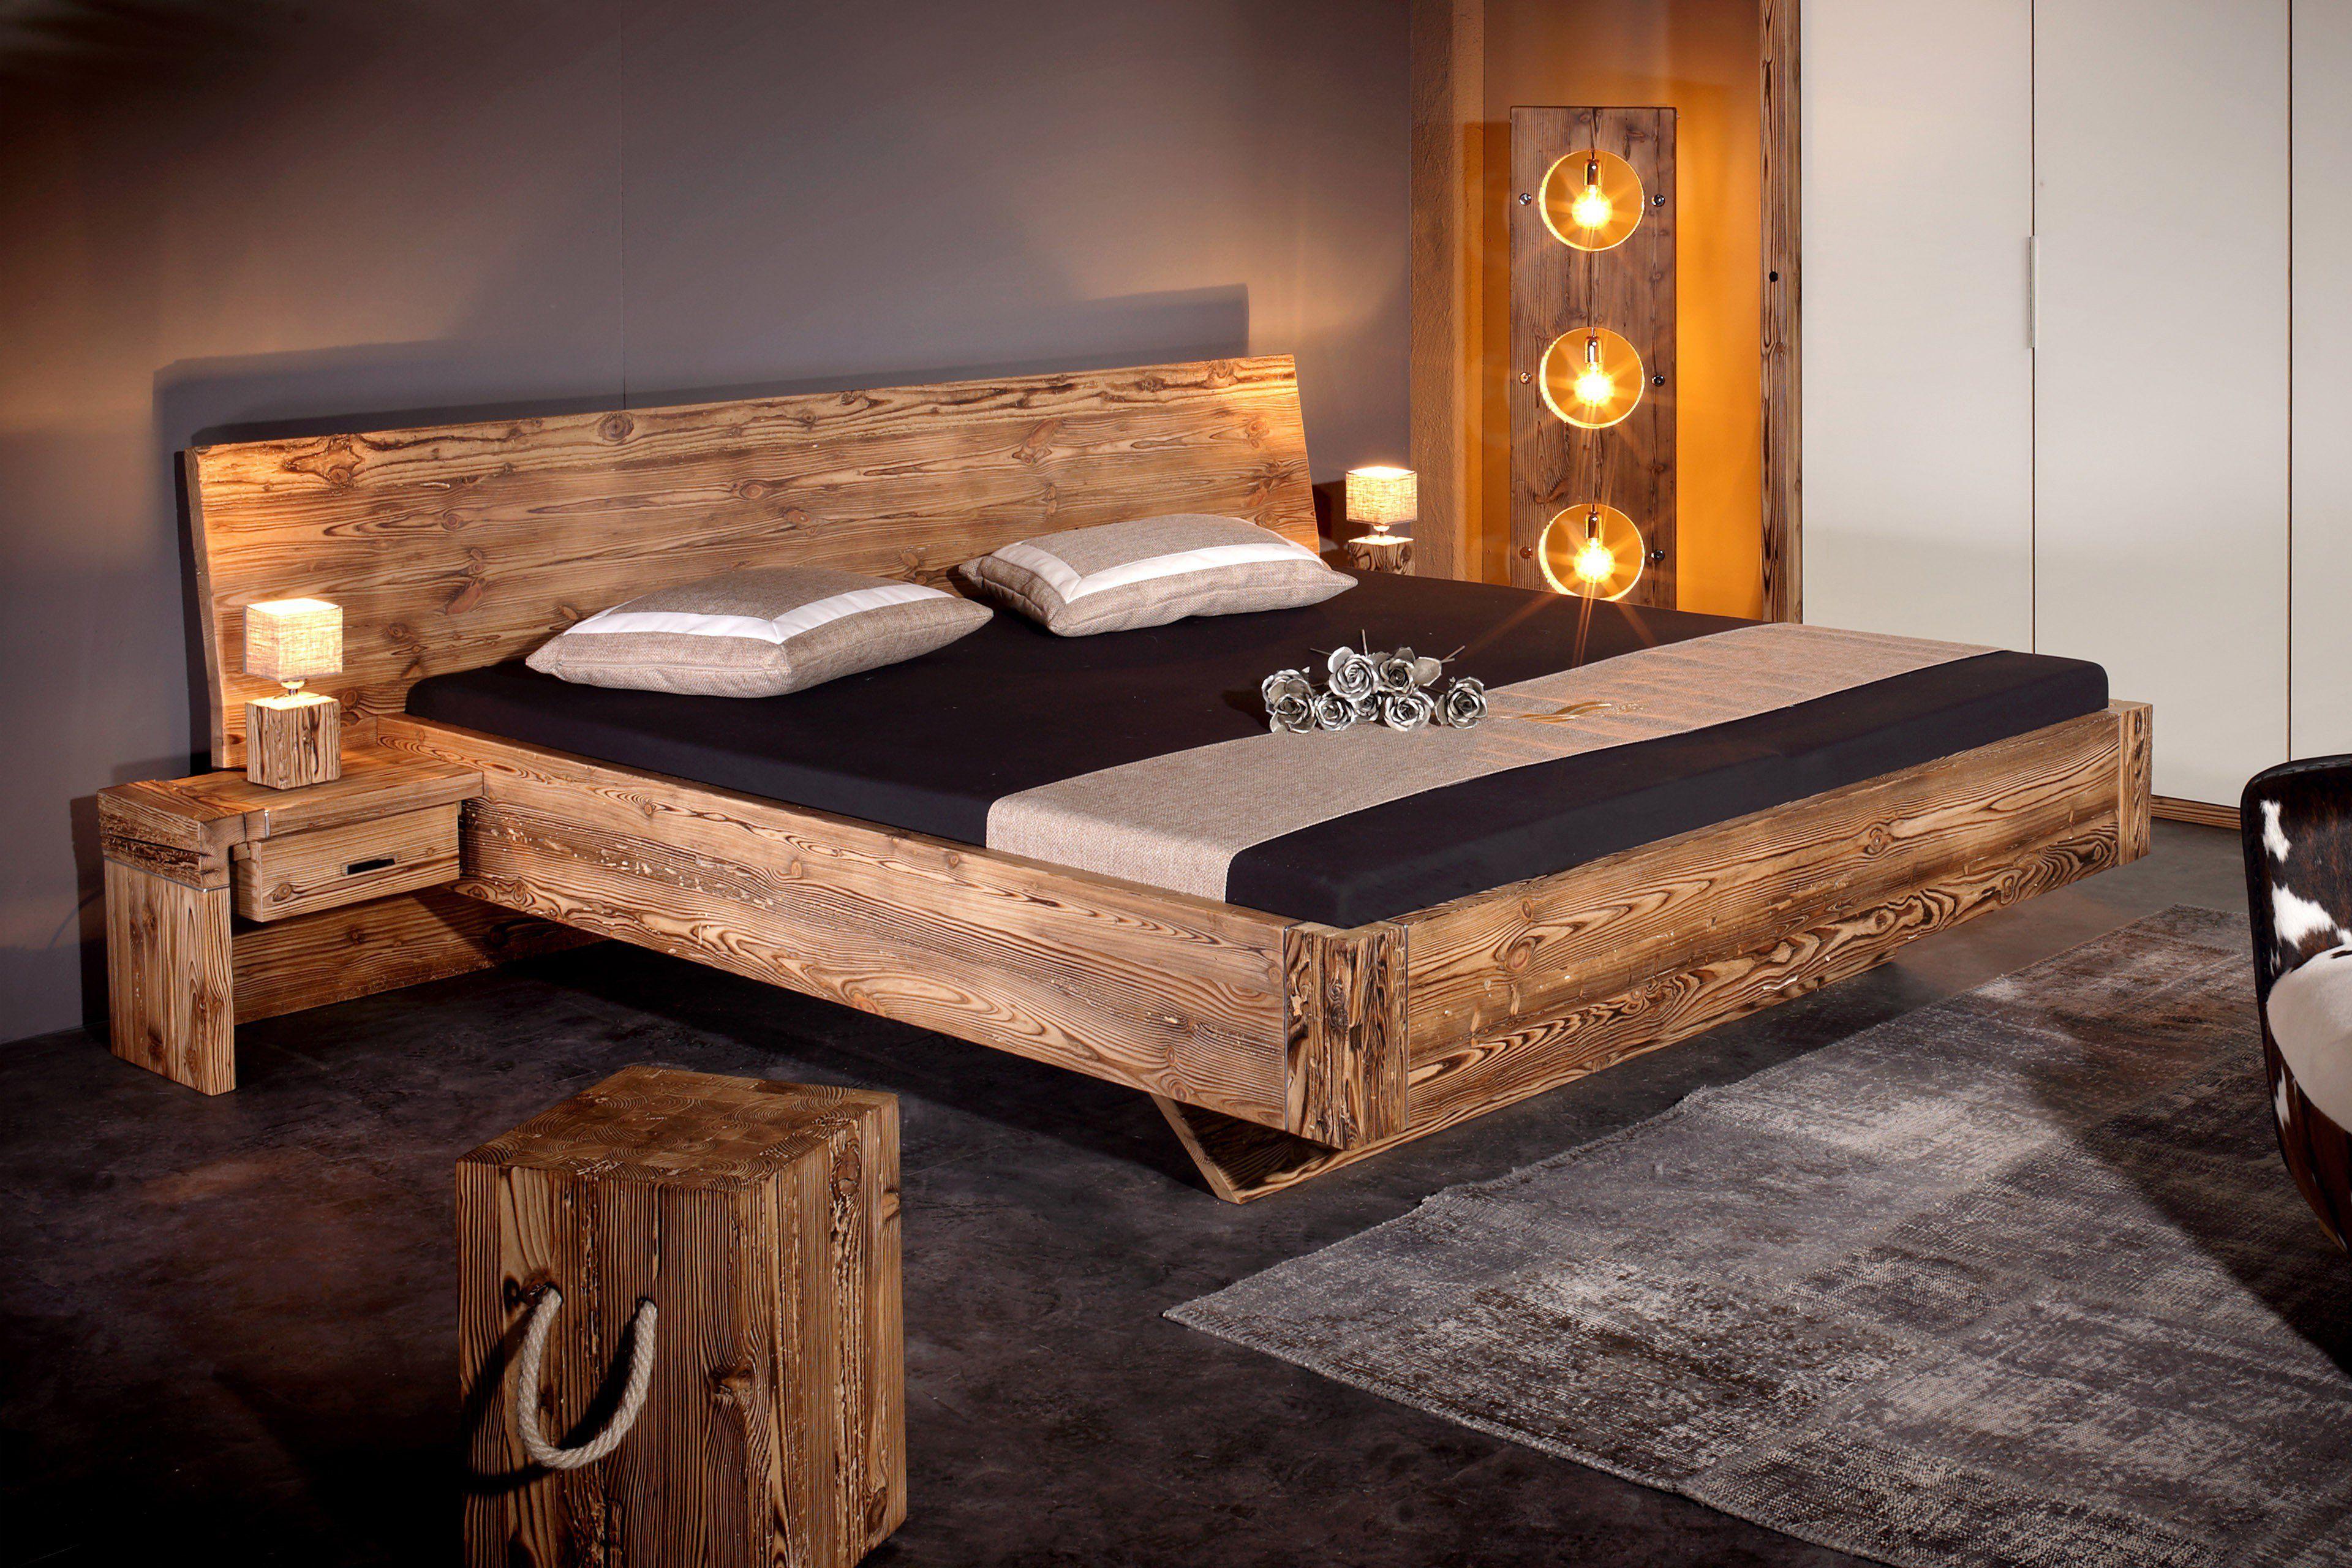 Tolle Betten Aus Massivholz Zuhause Bett Massivholz Zimmer